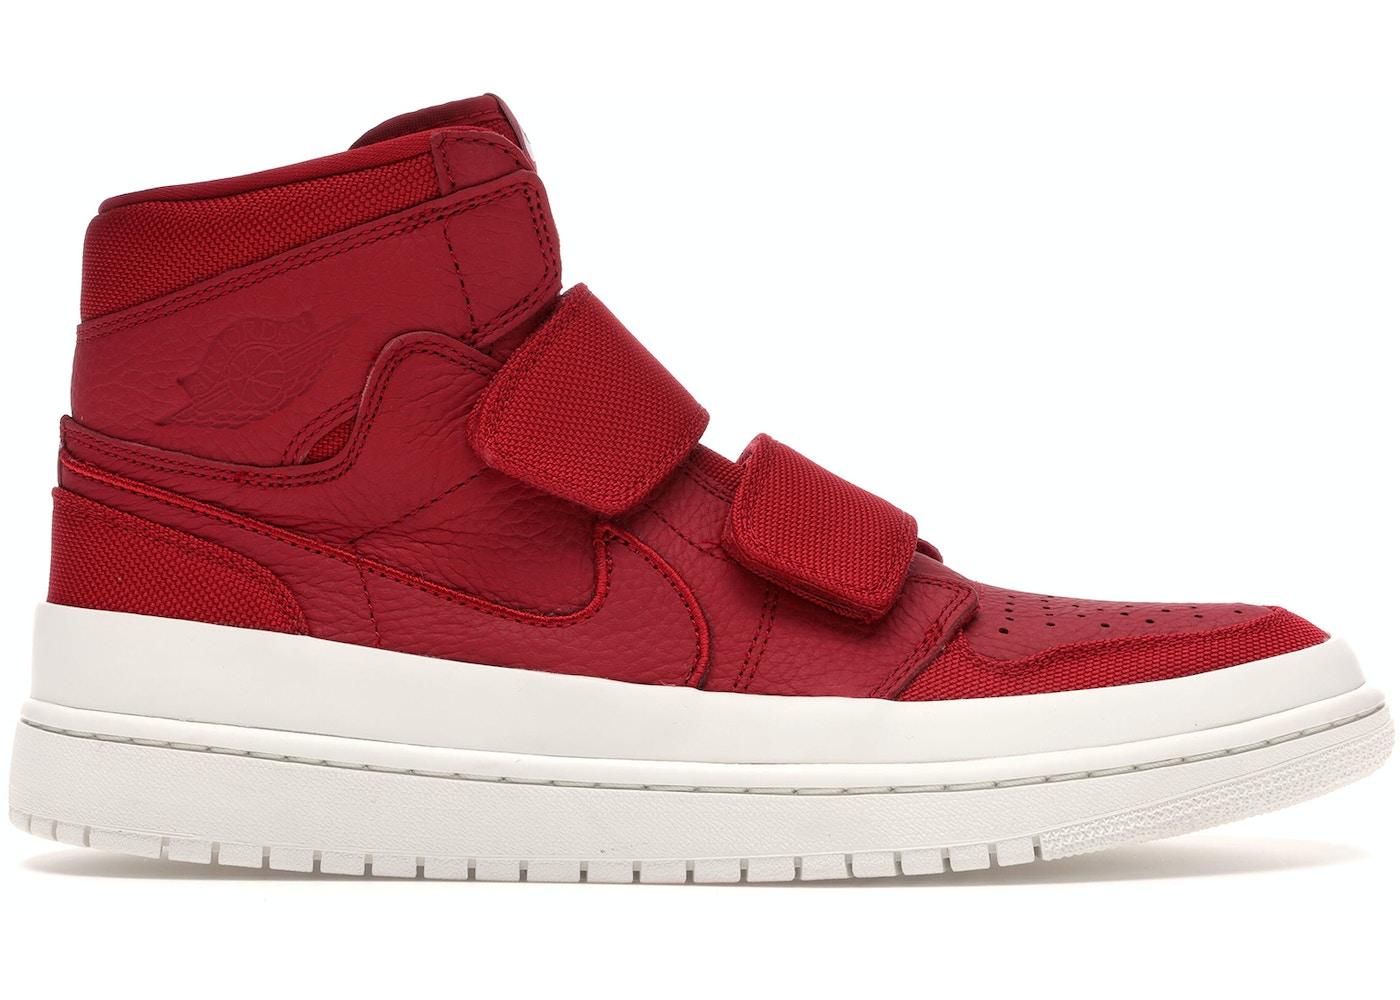 100% authentic dd980 e6684 Jordan 1 Retro High Double Strap Gym Red